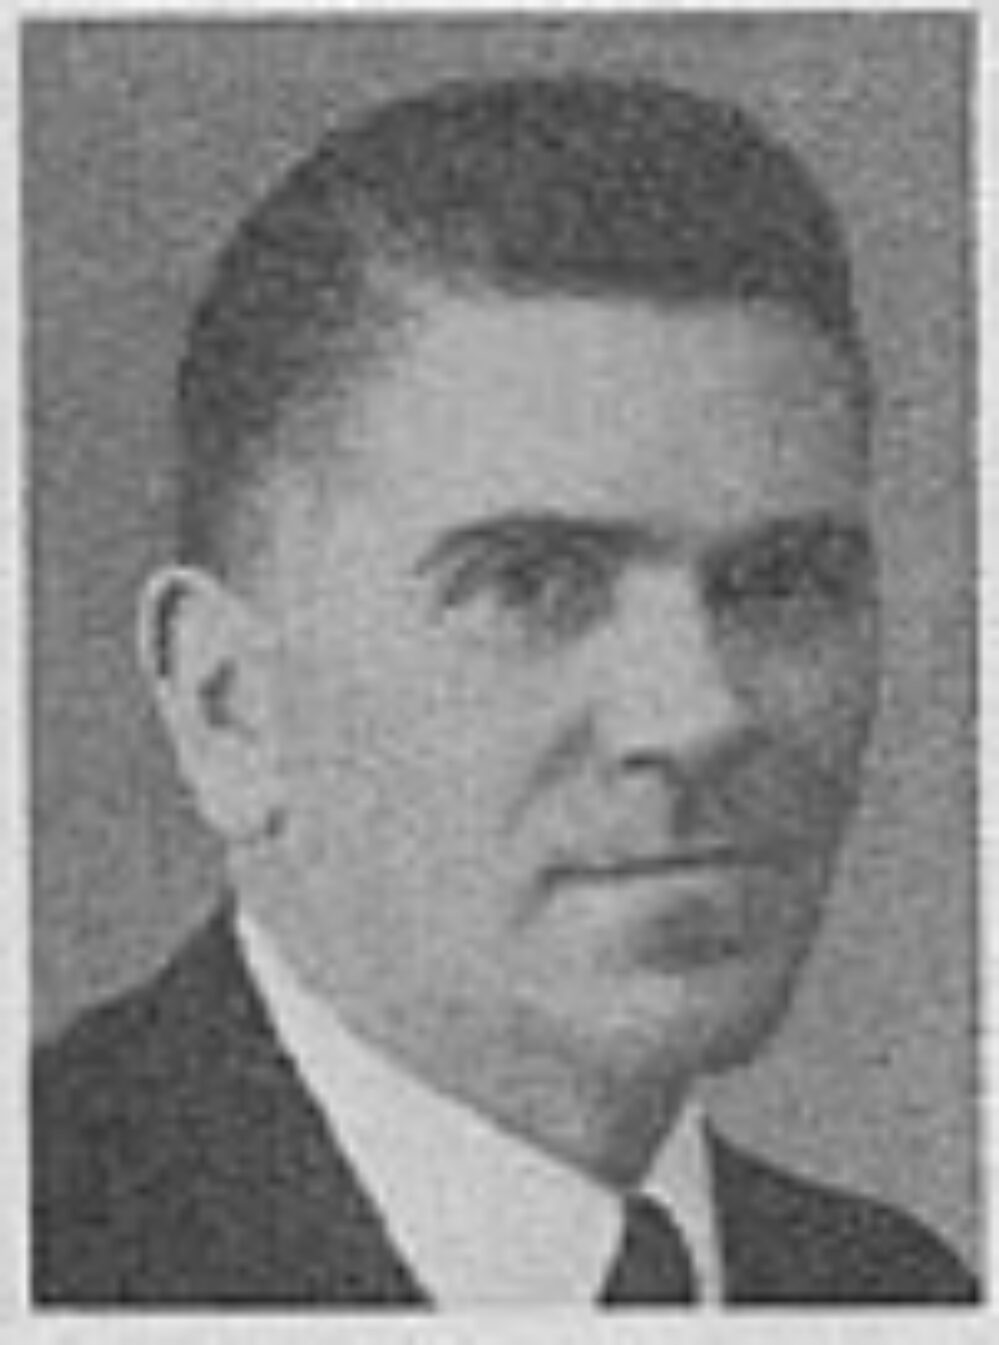 Sigurd Berntin Askeland